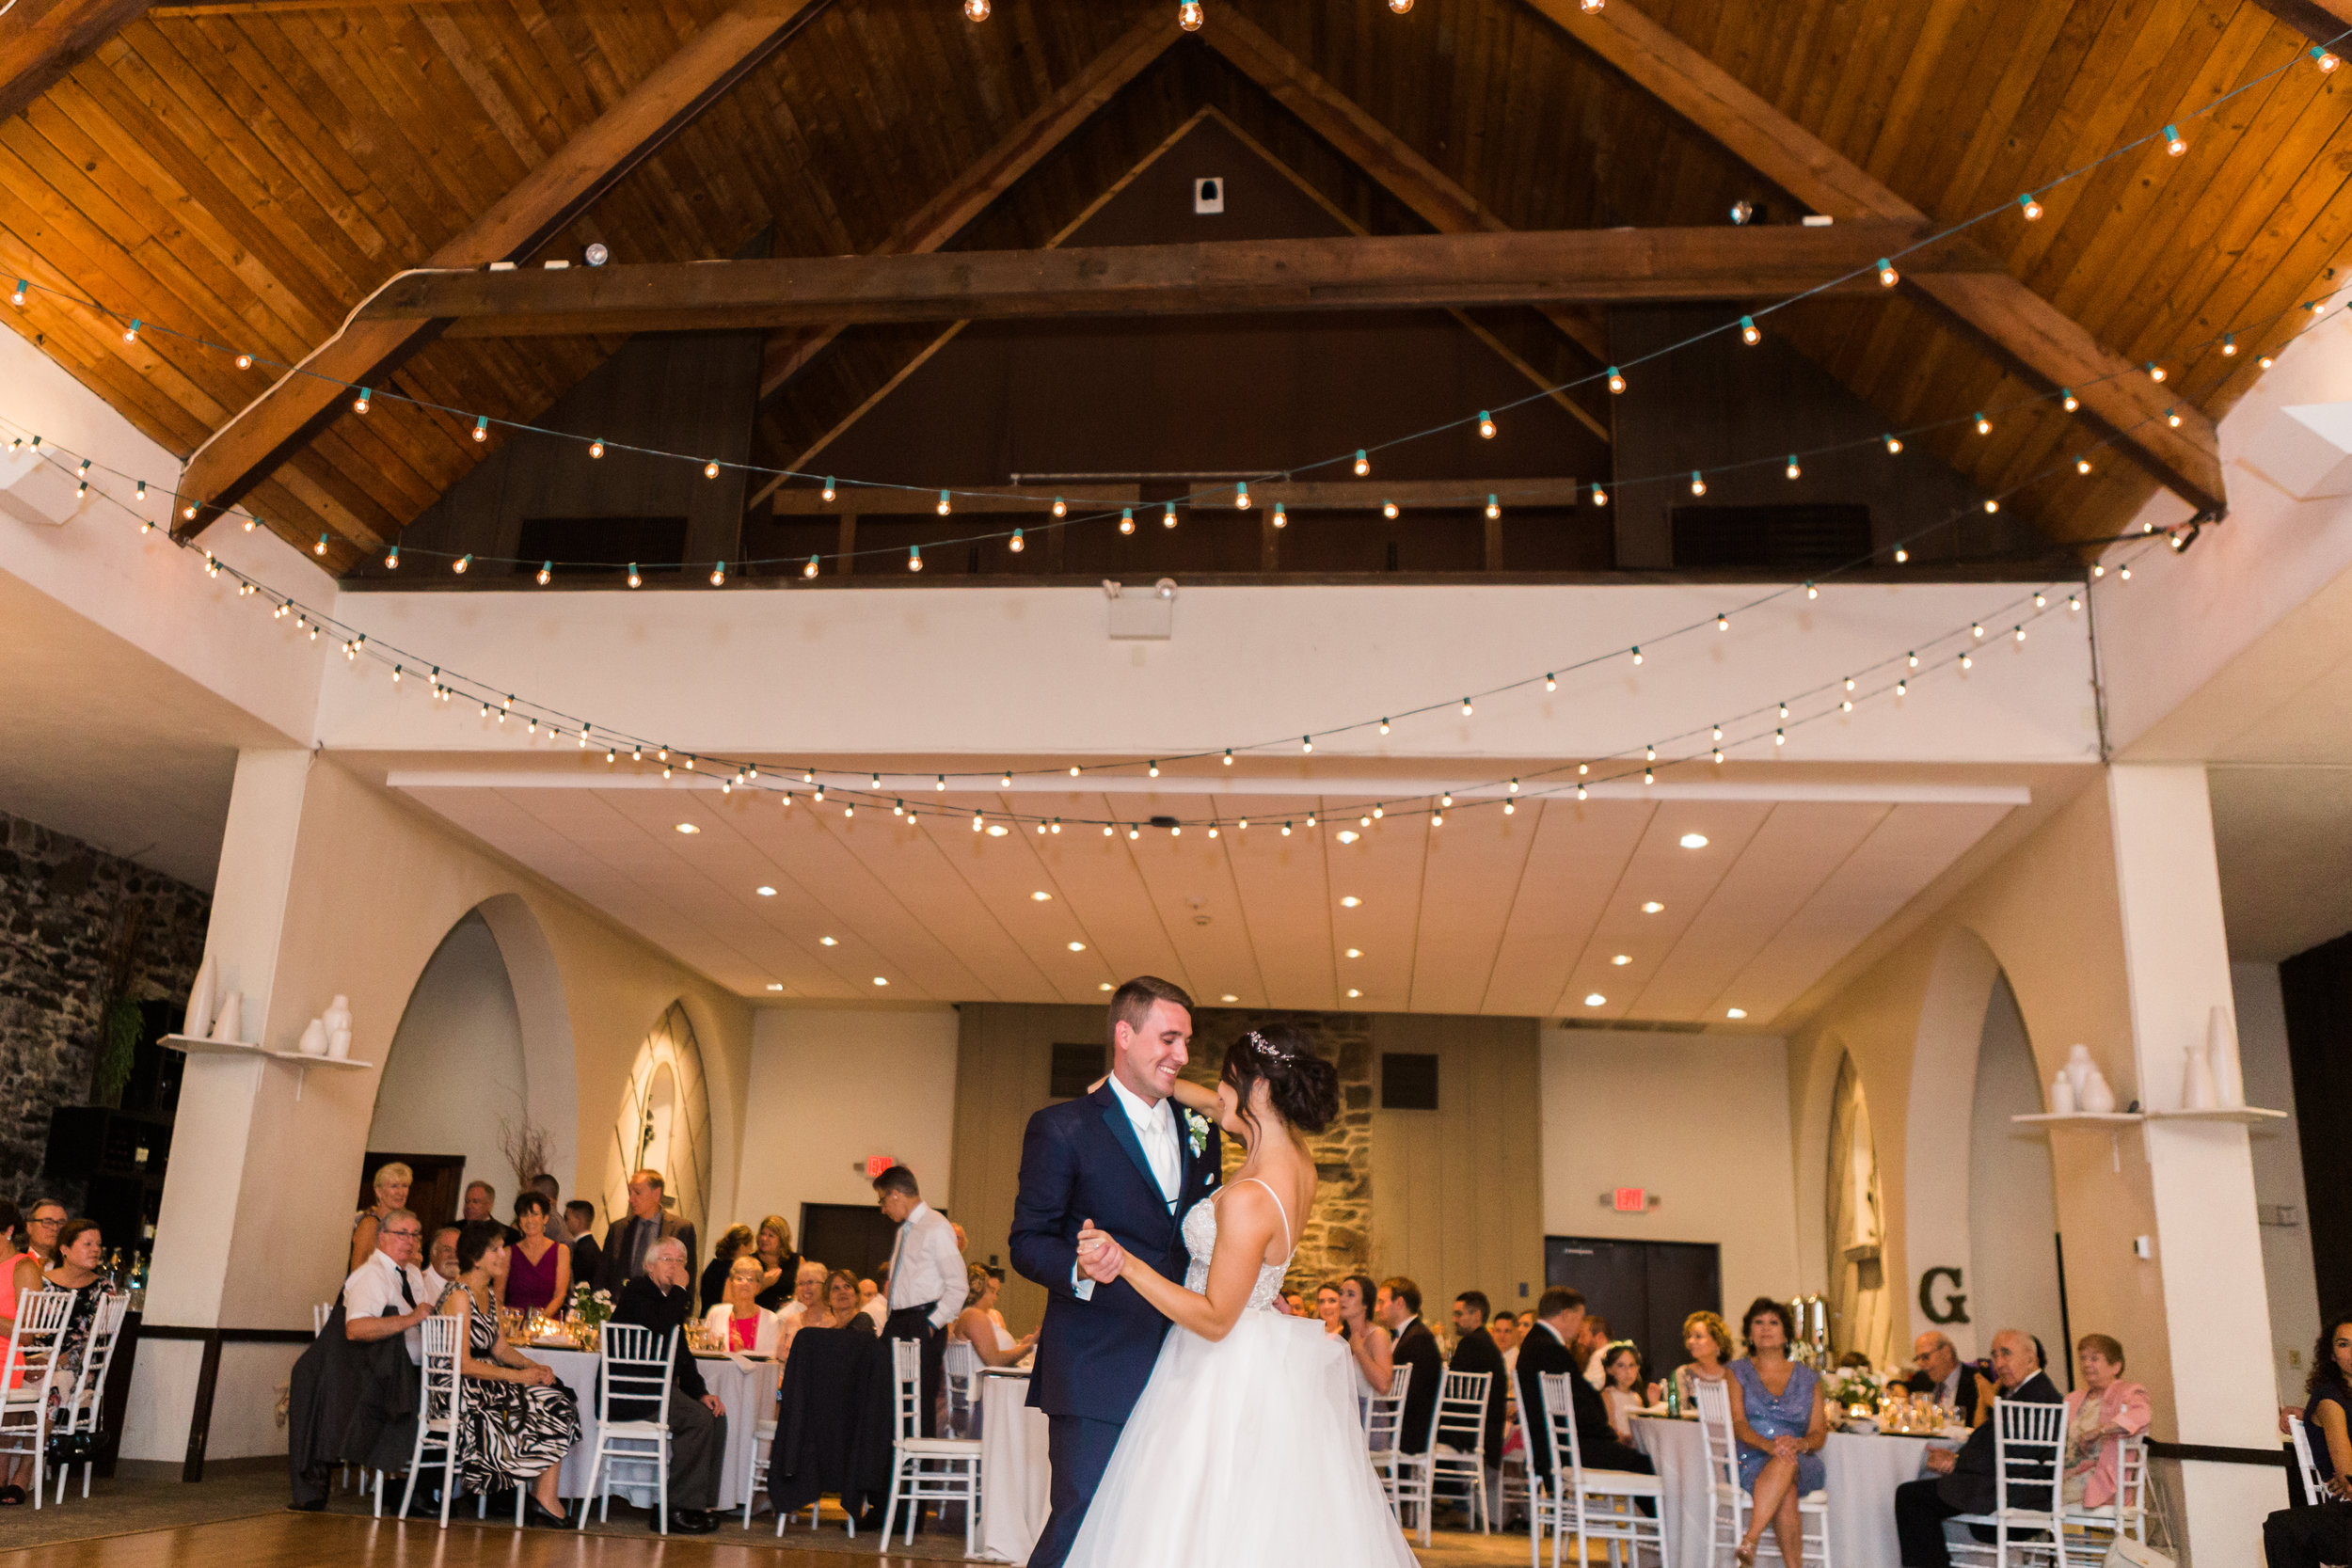 EGP-wedding-671 - Copy.jpg